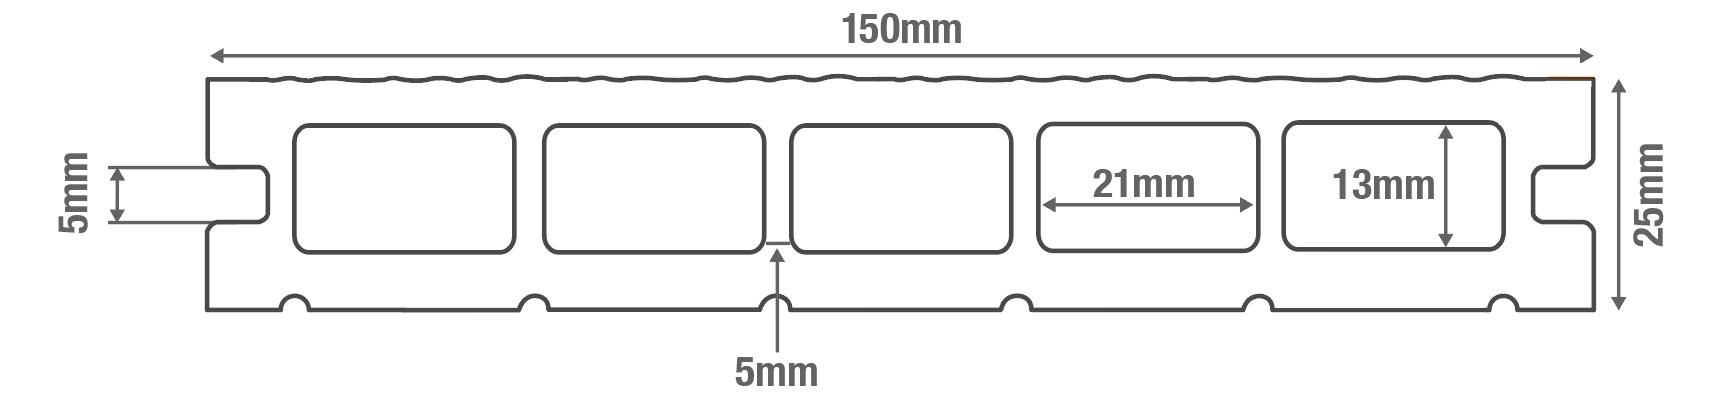 Woodgrain Effect Hollow Domestic Grade Composite Decking Board Diagram